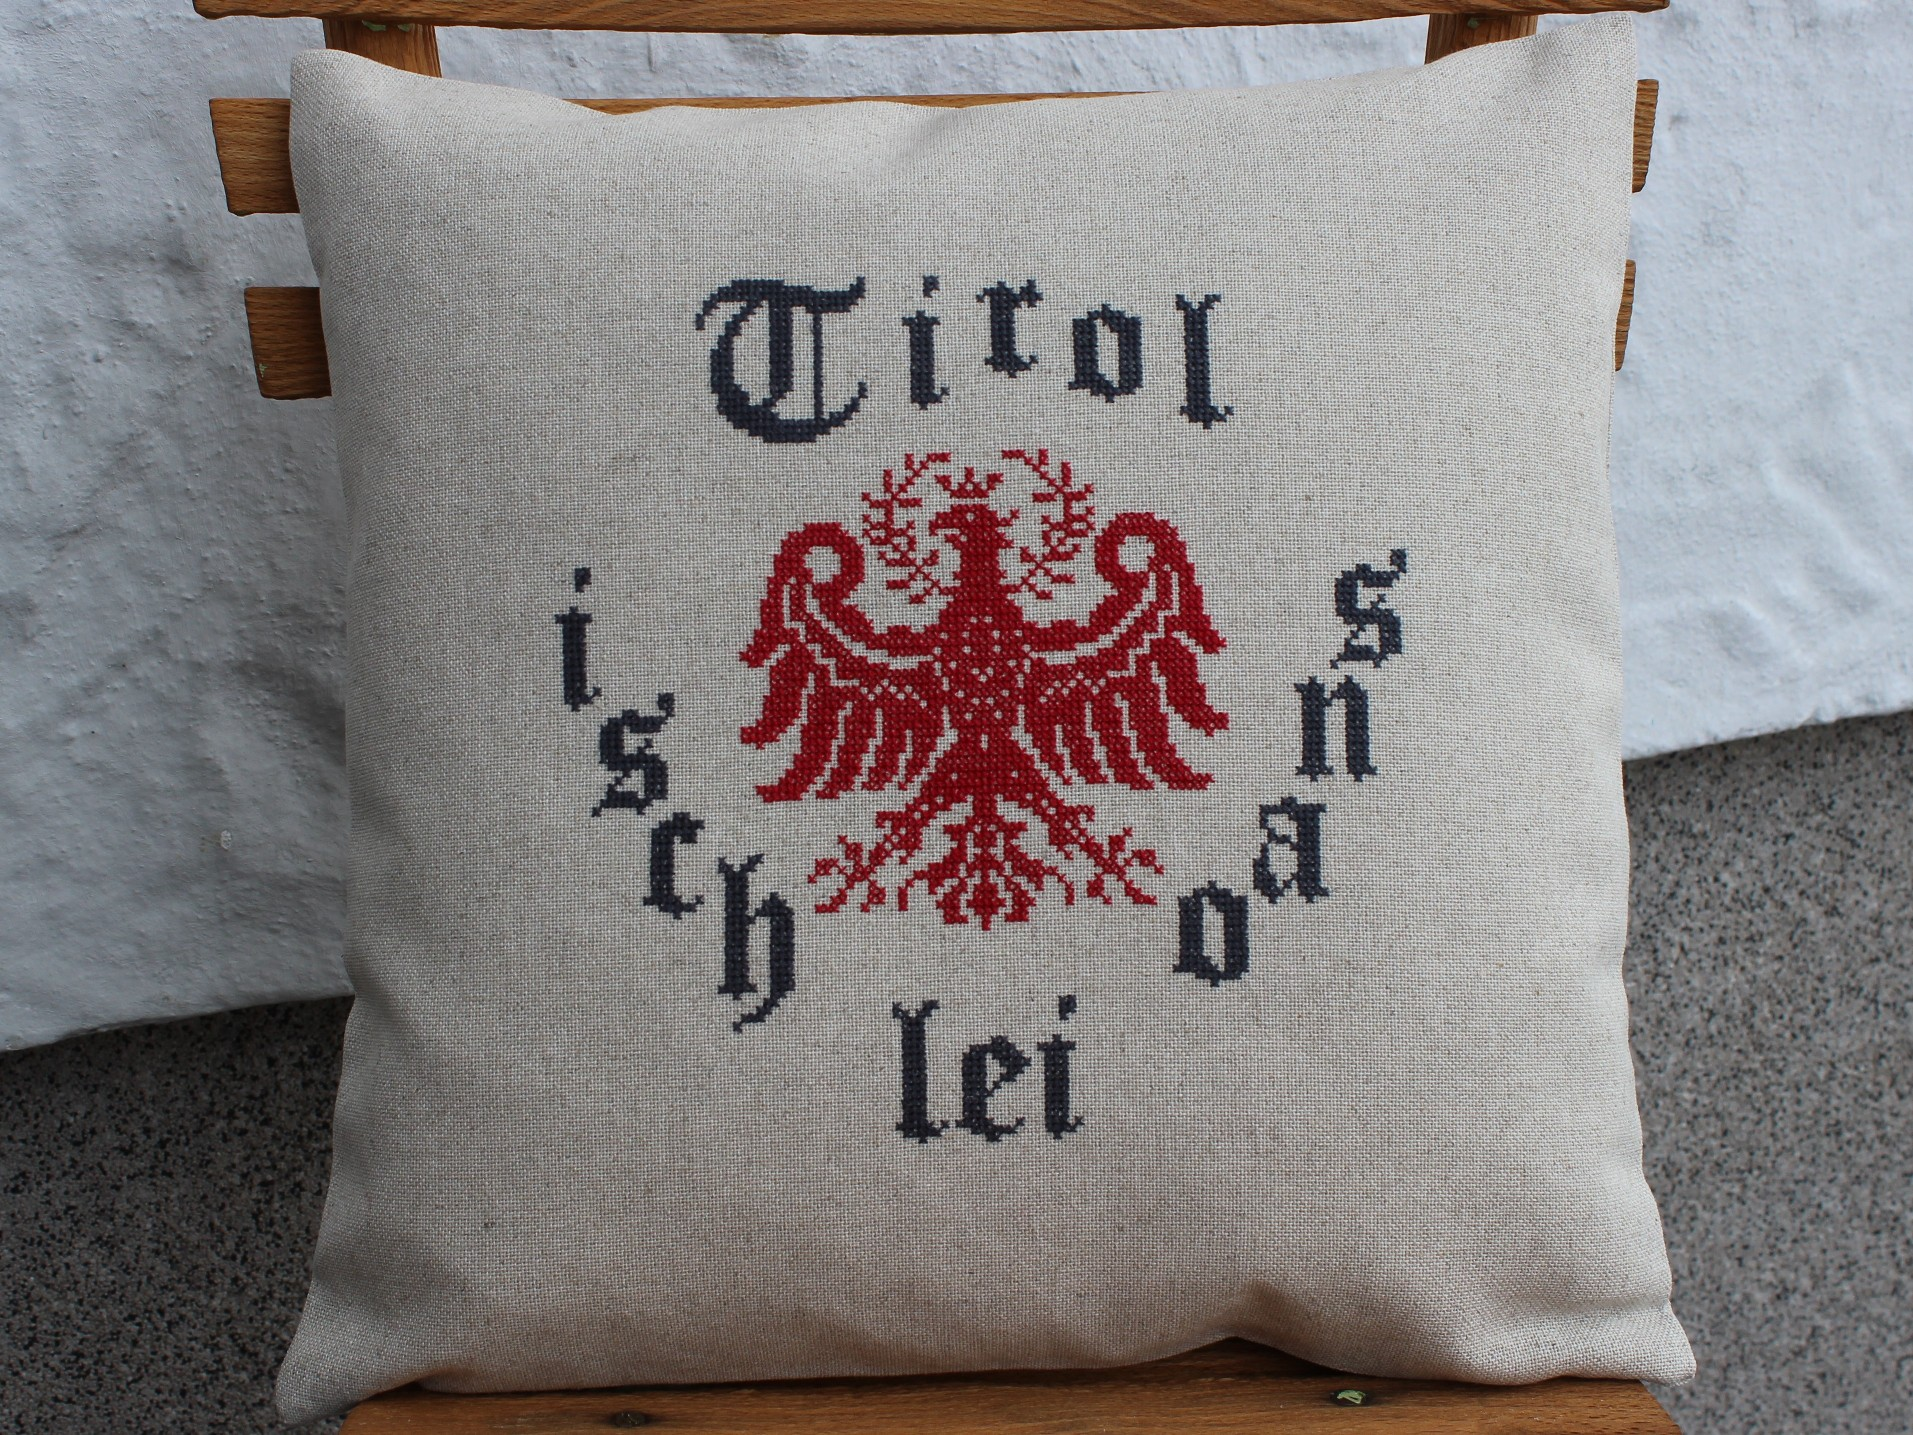 Adler Kissen Tirol isch lei oans